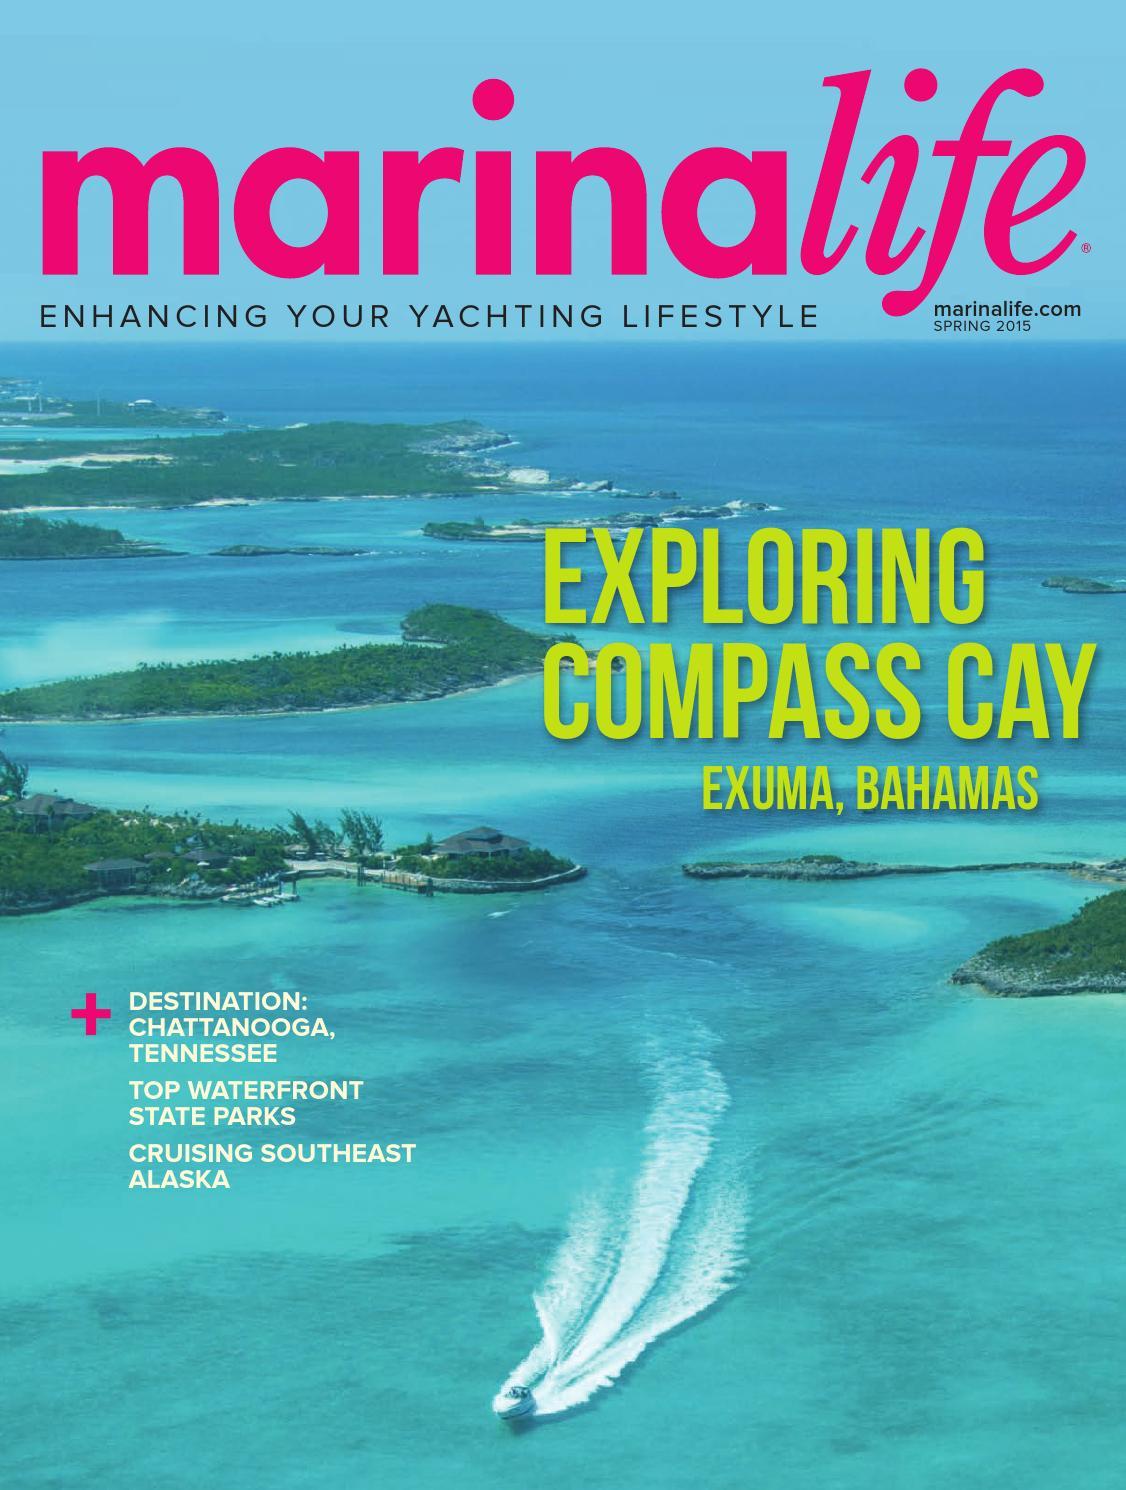 Marinalife Magazine Spring 2015Marinalife, Llc - Issuu With Bethel Park Public School Calendar 2021 20